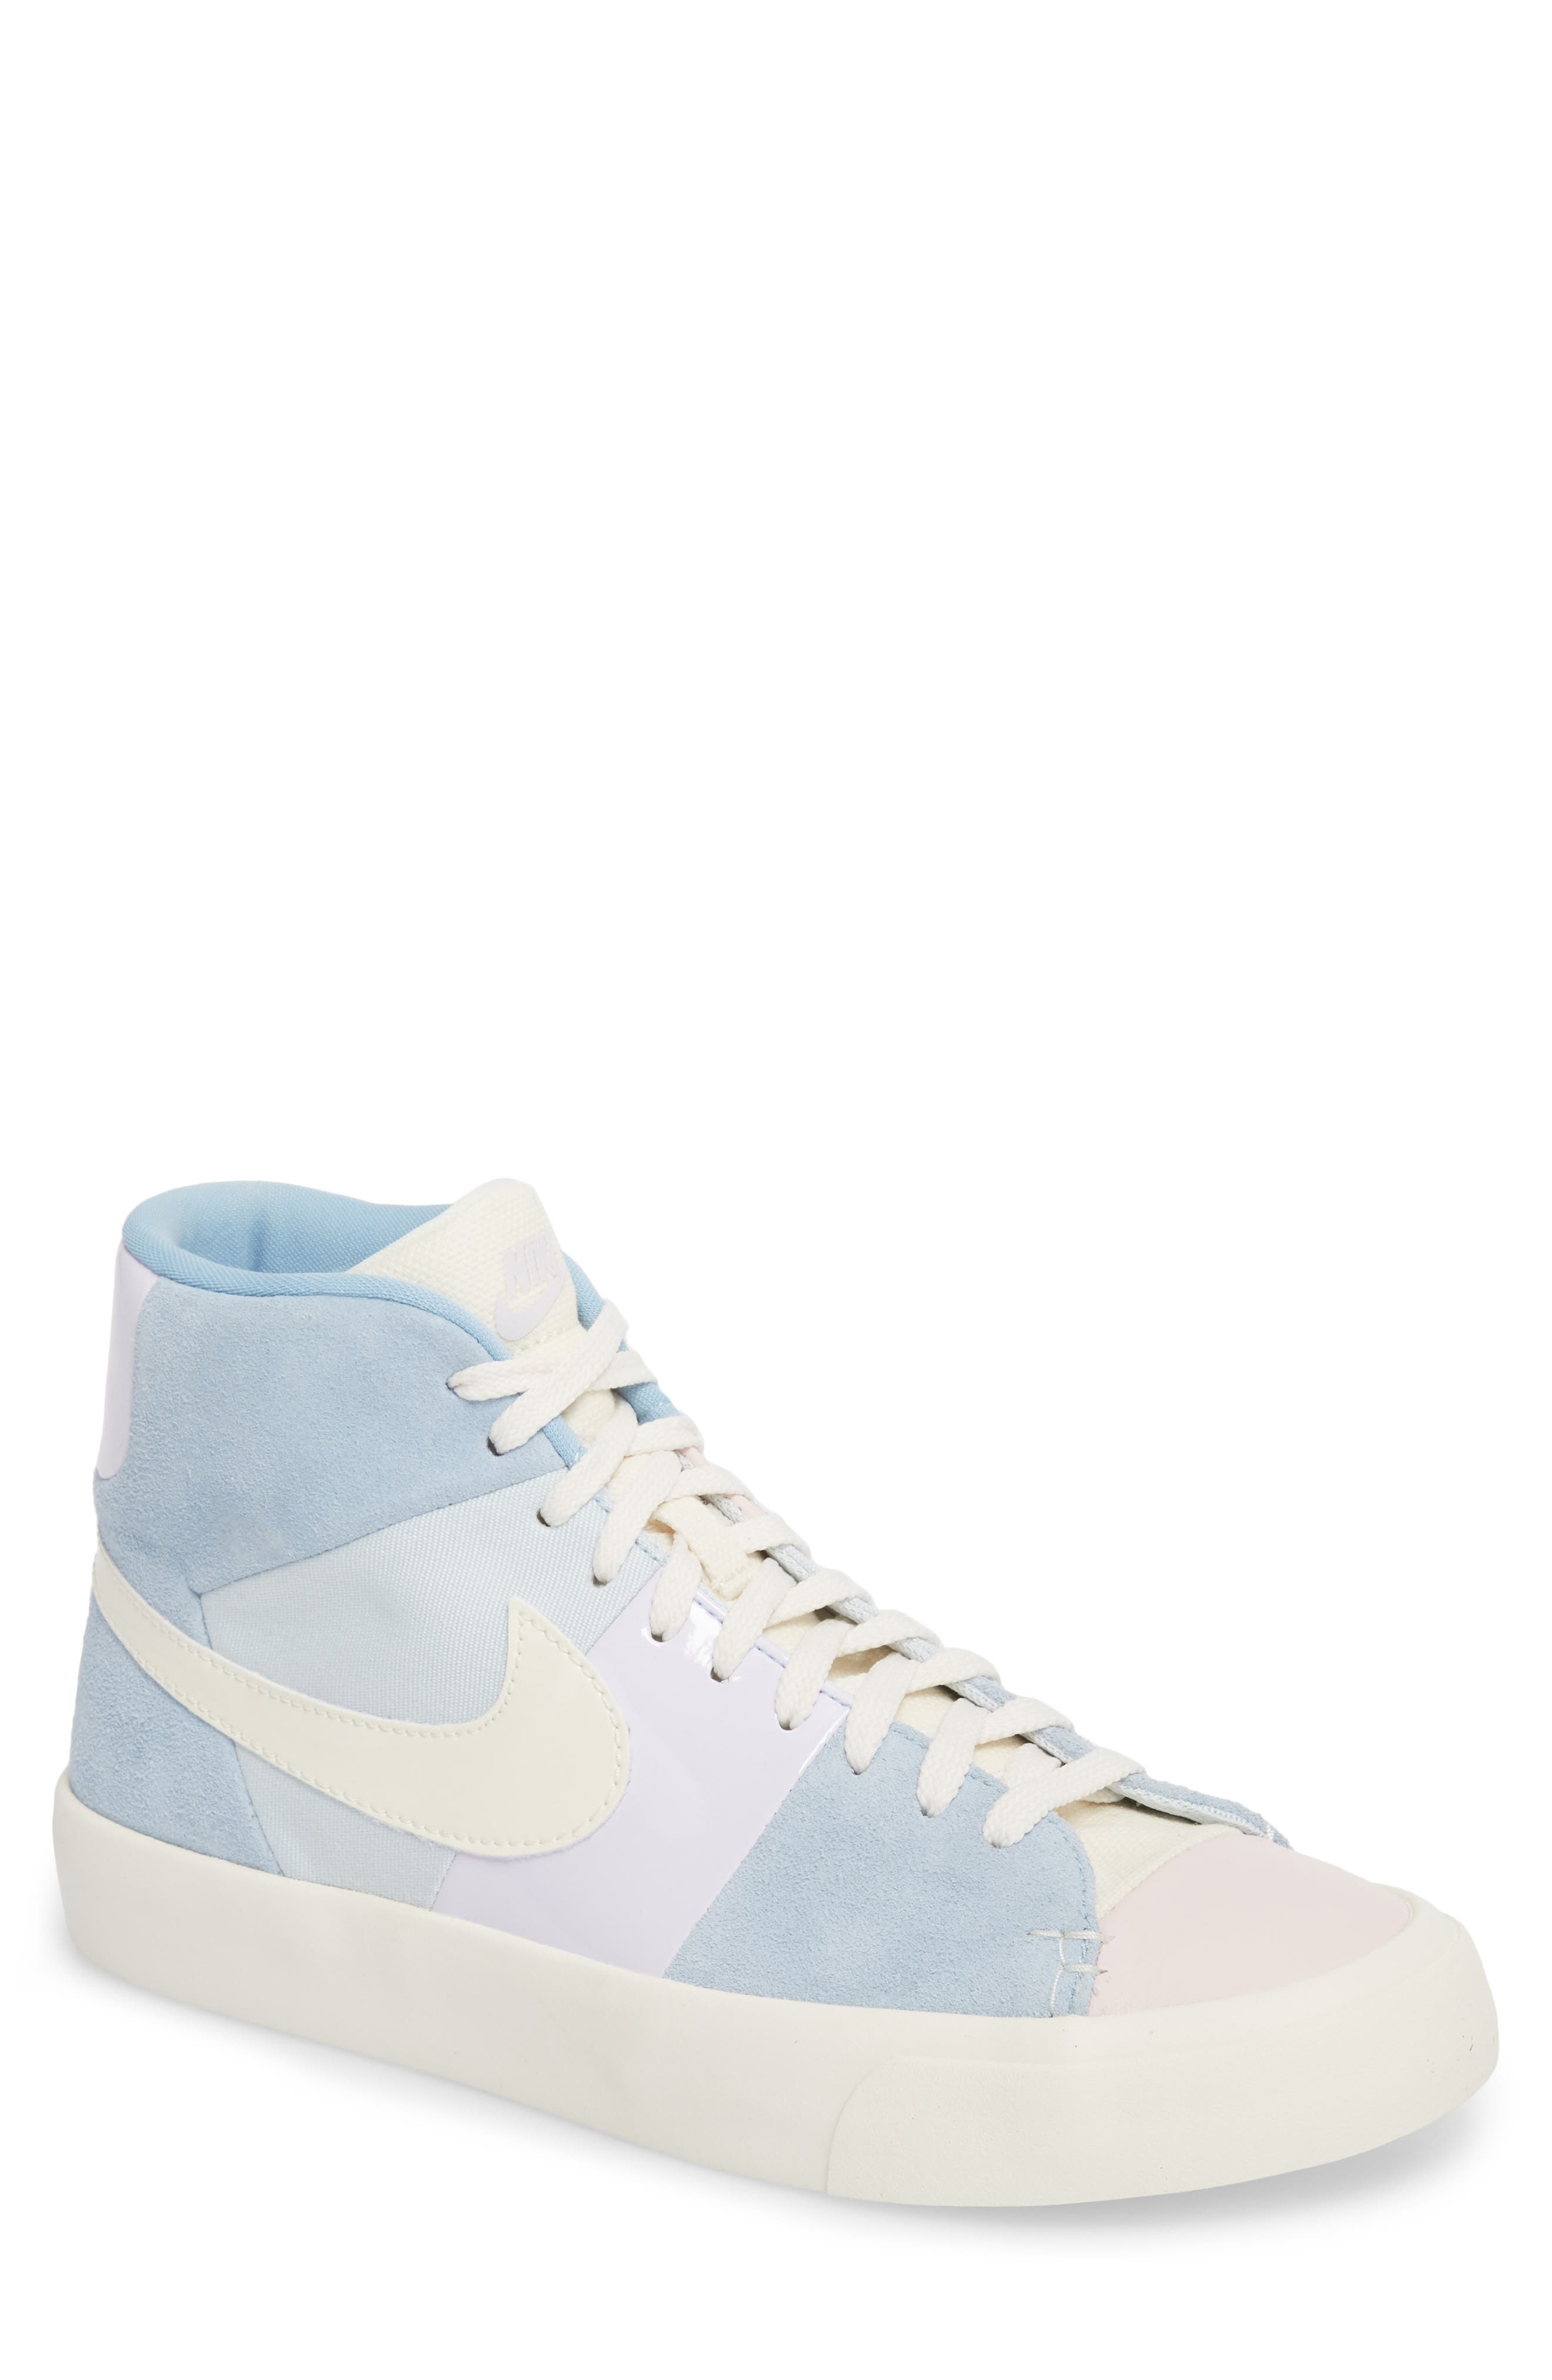 Blazer Royal Easter QS High Top Sneaker,                         Main,                         color, 650